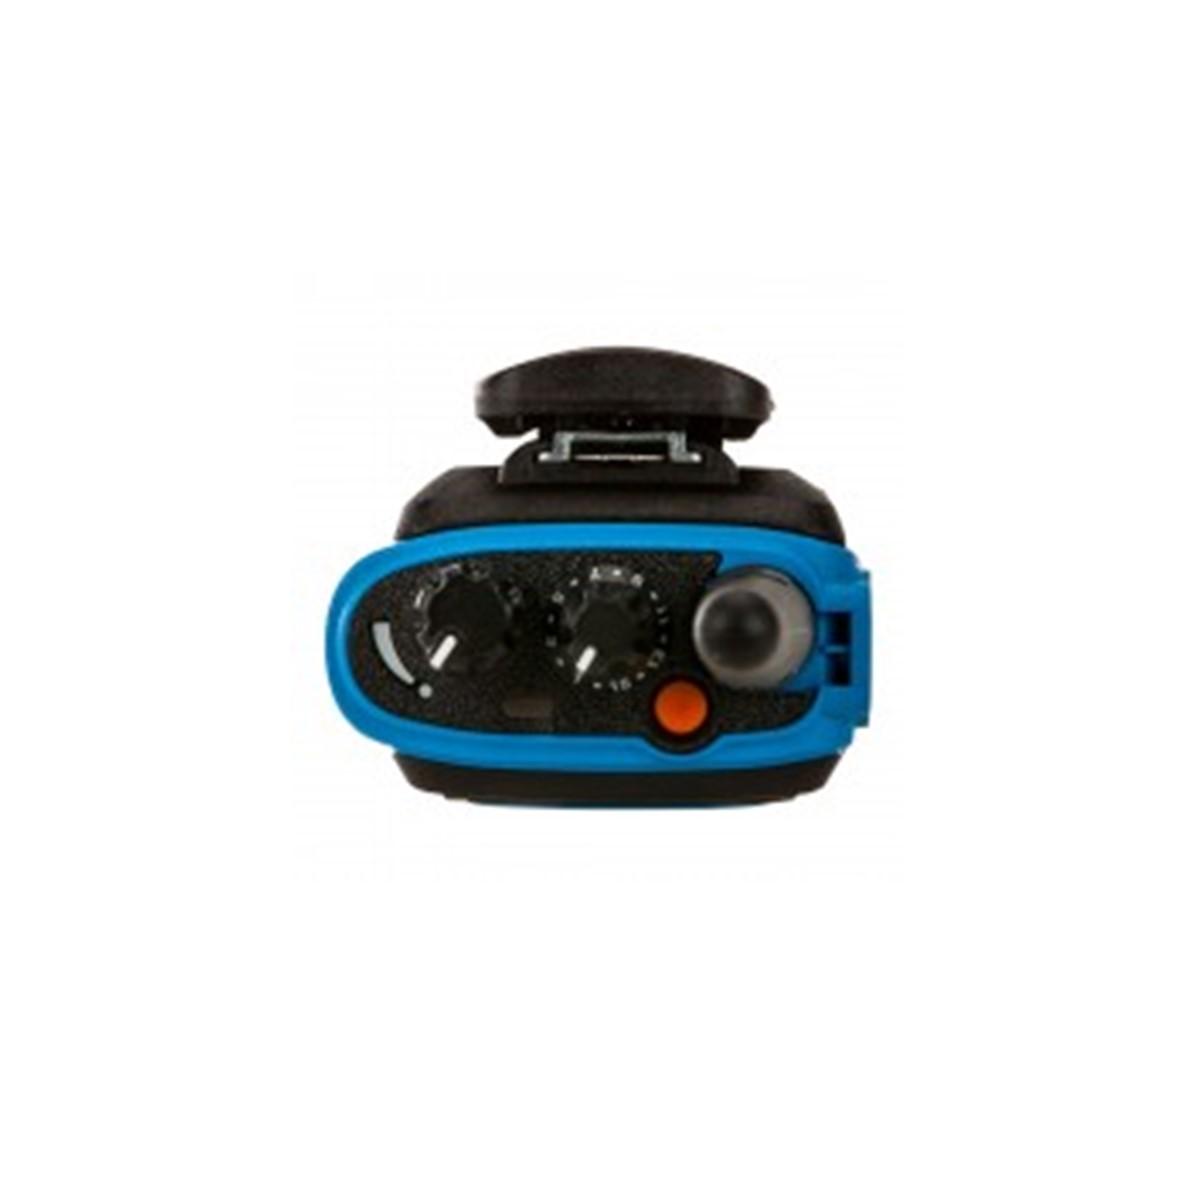 Radio Motorola DGP8050EX Digital Intrínsecamente Seguro LAH56JCC9PA3AN VHF 136-174 MHz